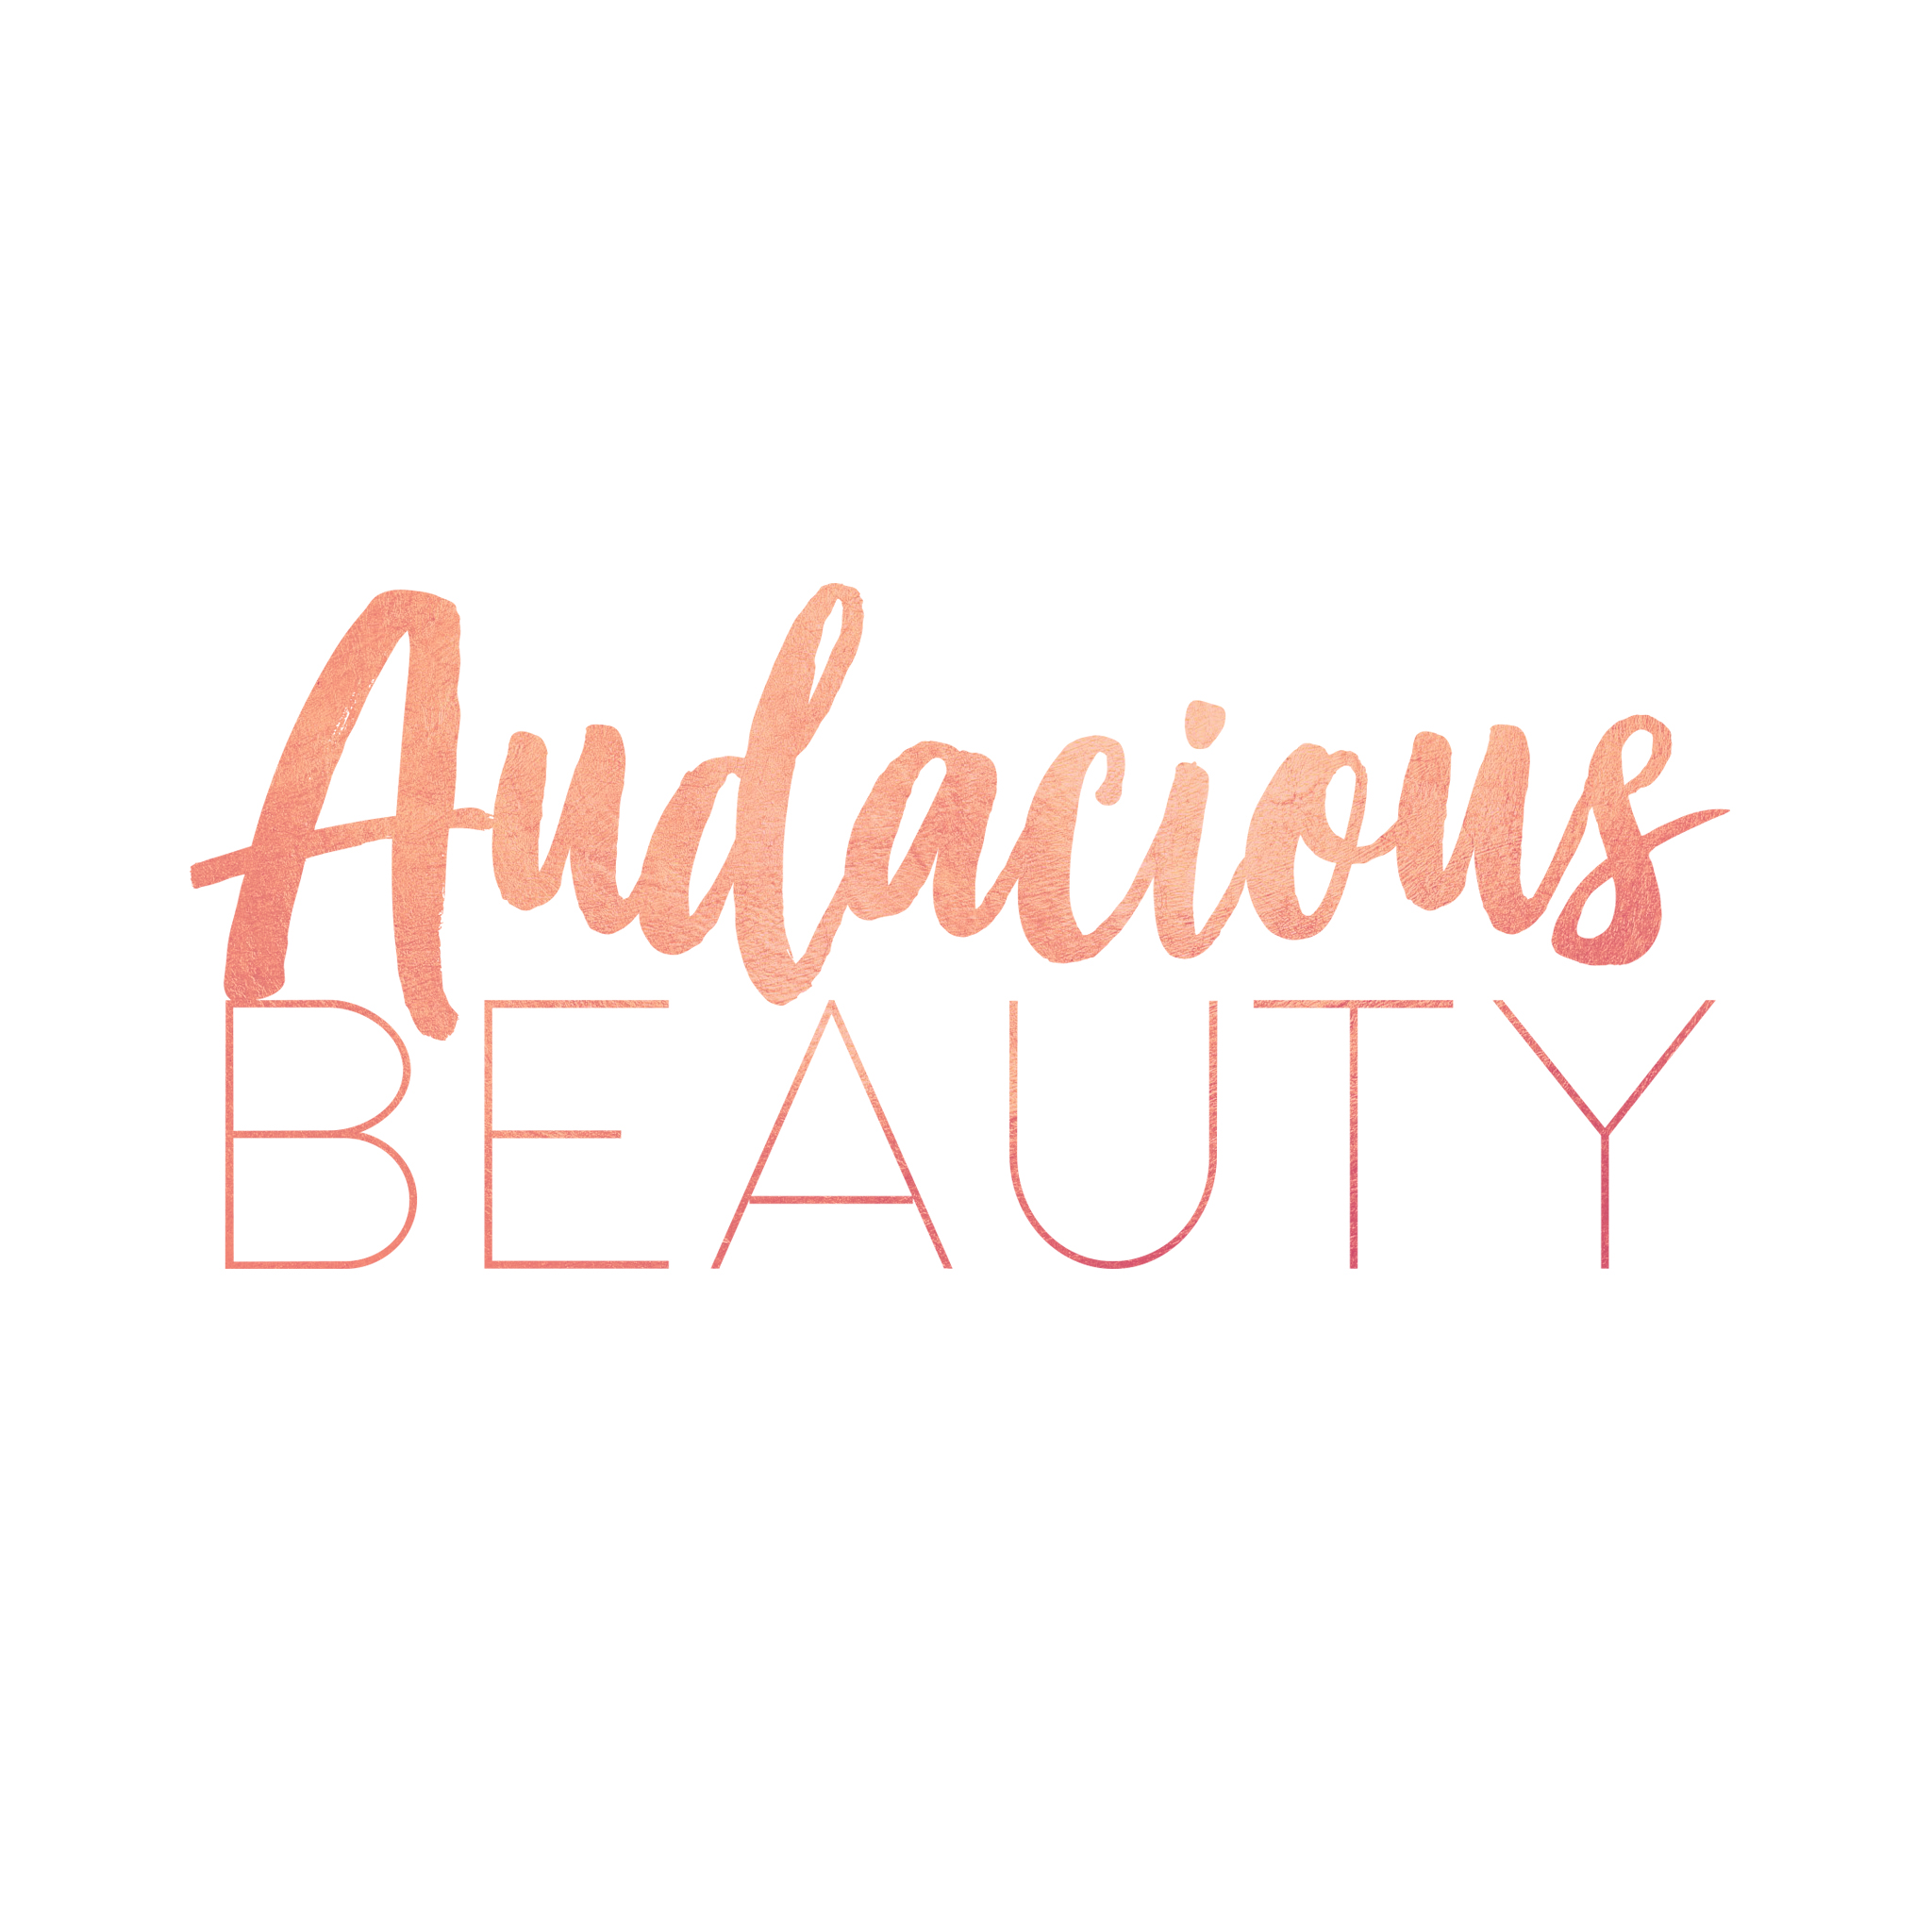 AUDACIOUS BEAUTY-whiteandgold.jpg